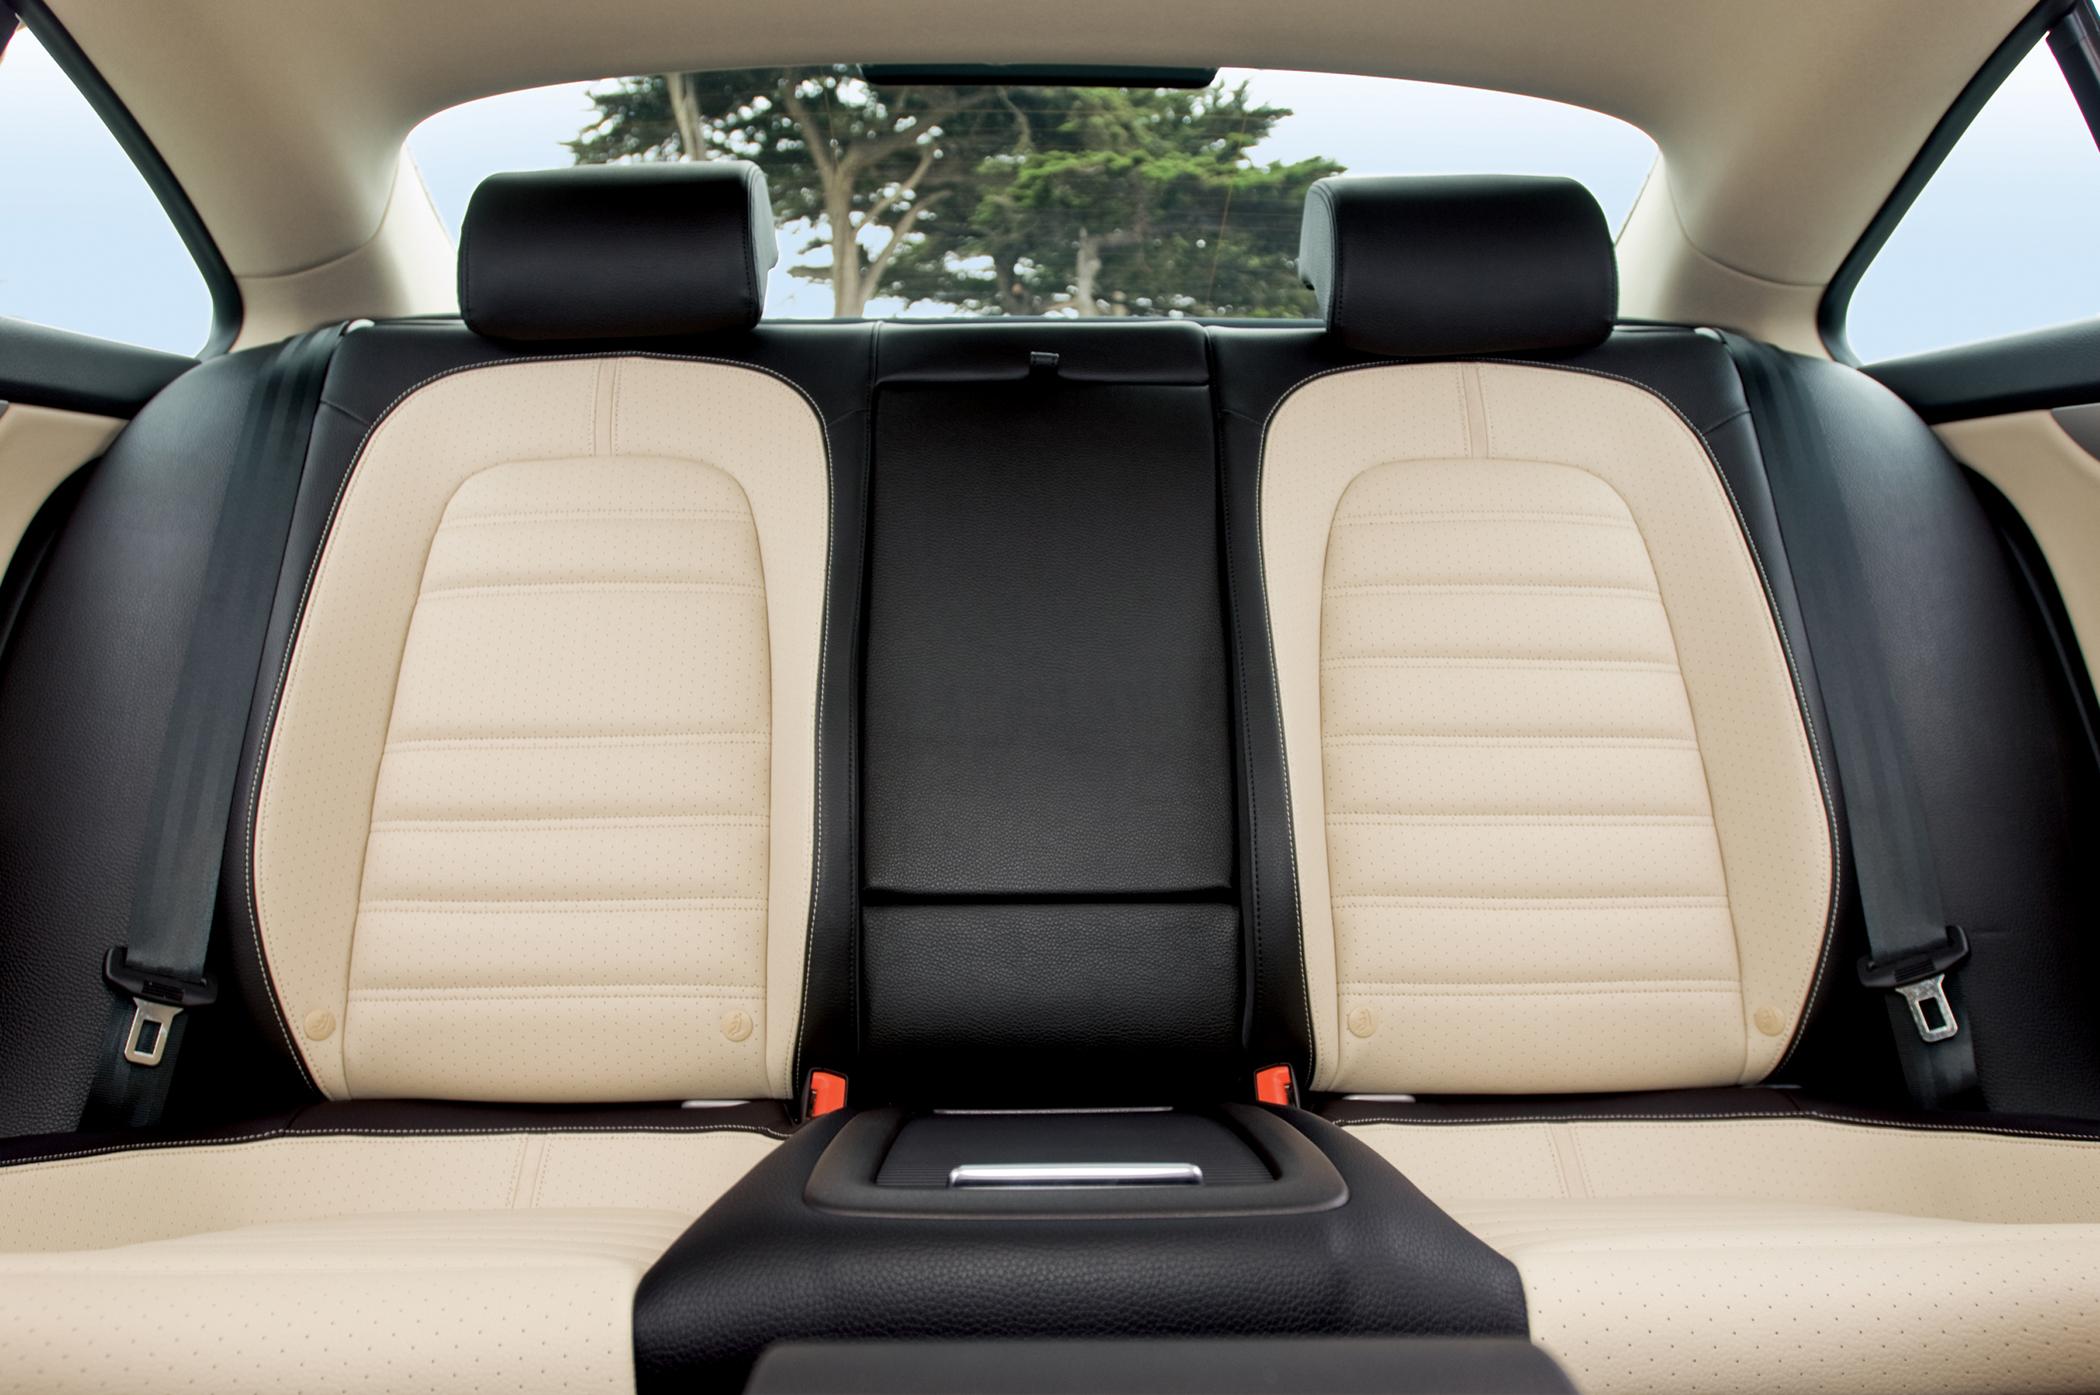 volkswagen auto news of enhanced nrw cc interior output passat vw with power